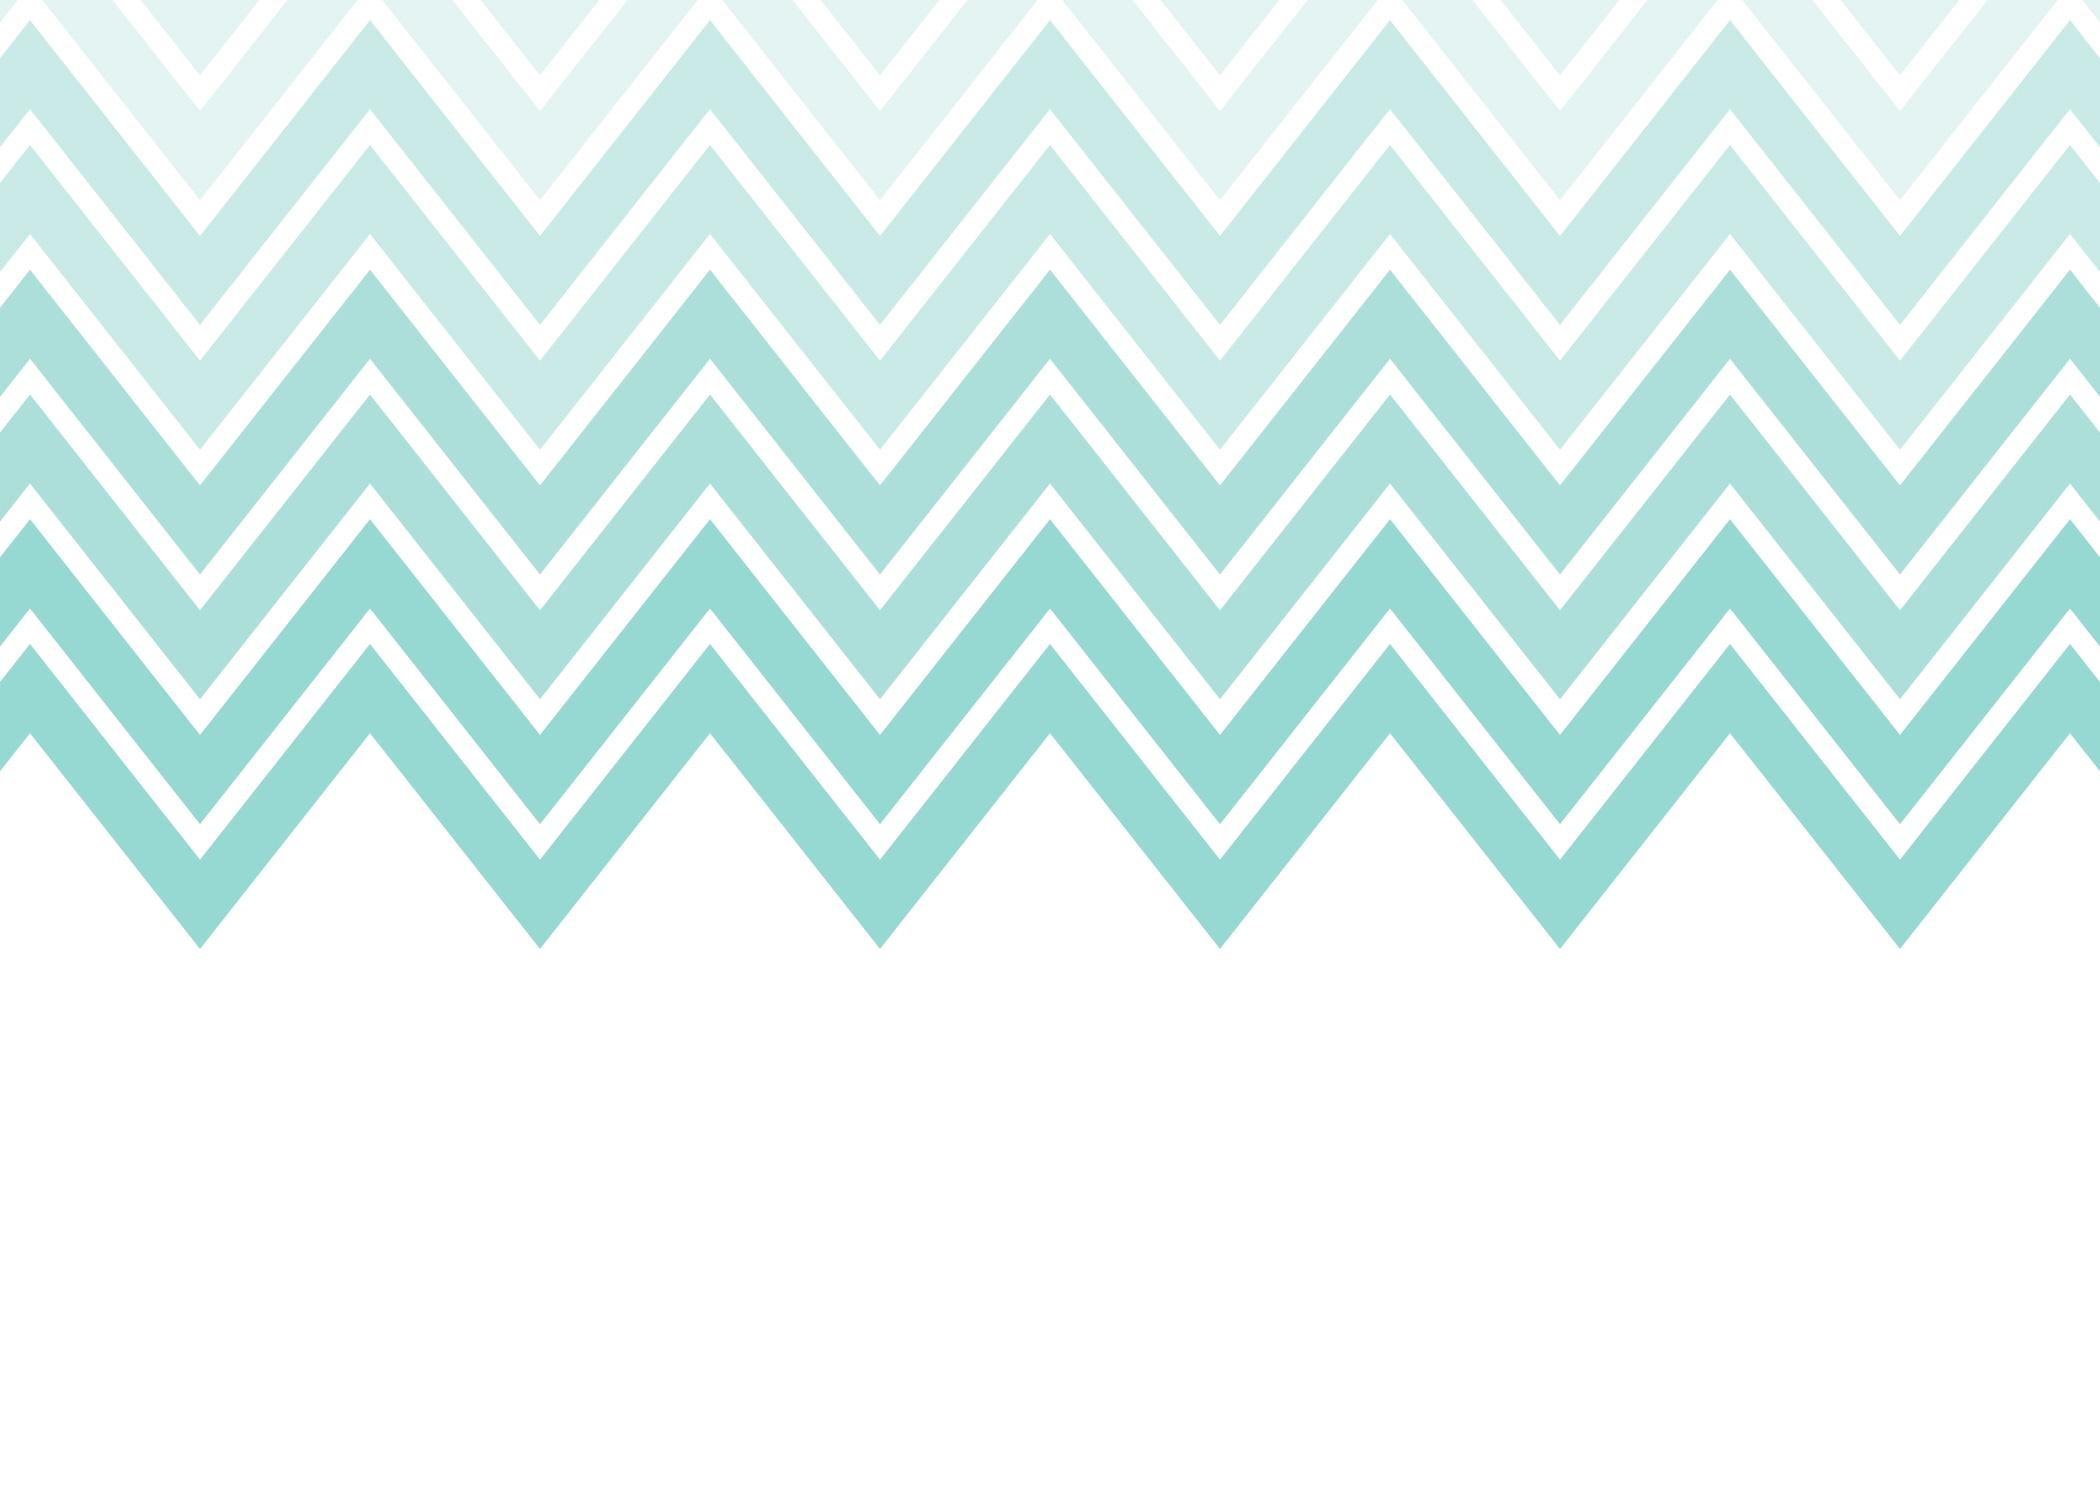 Aqua And Gray Chevron Wallpaper Wallpapersafari